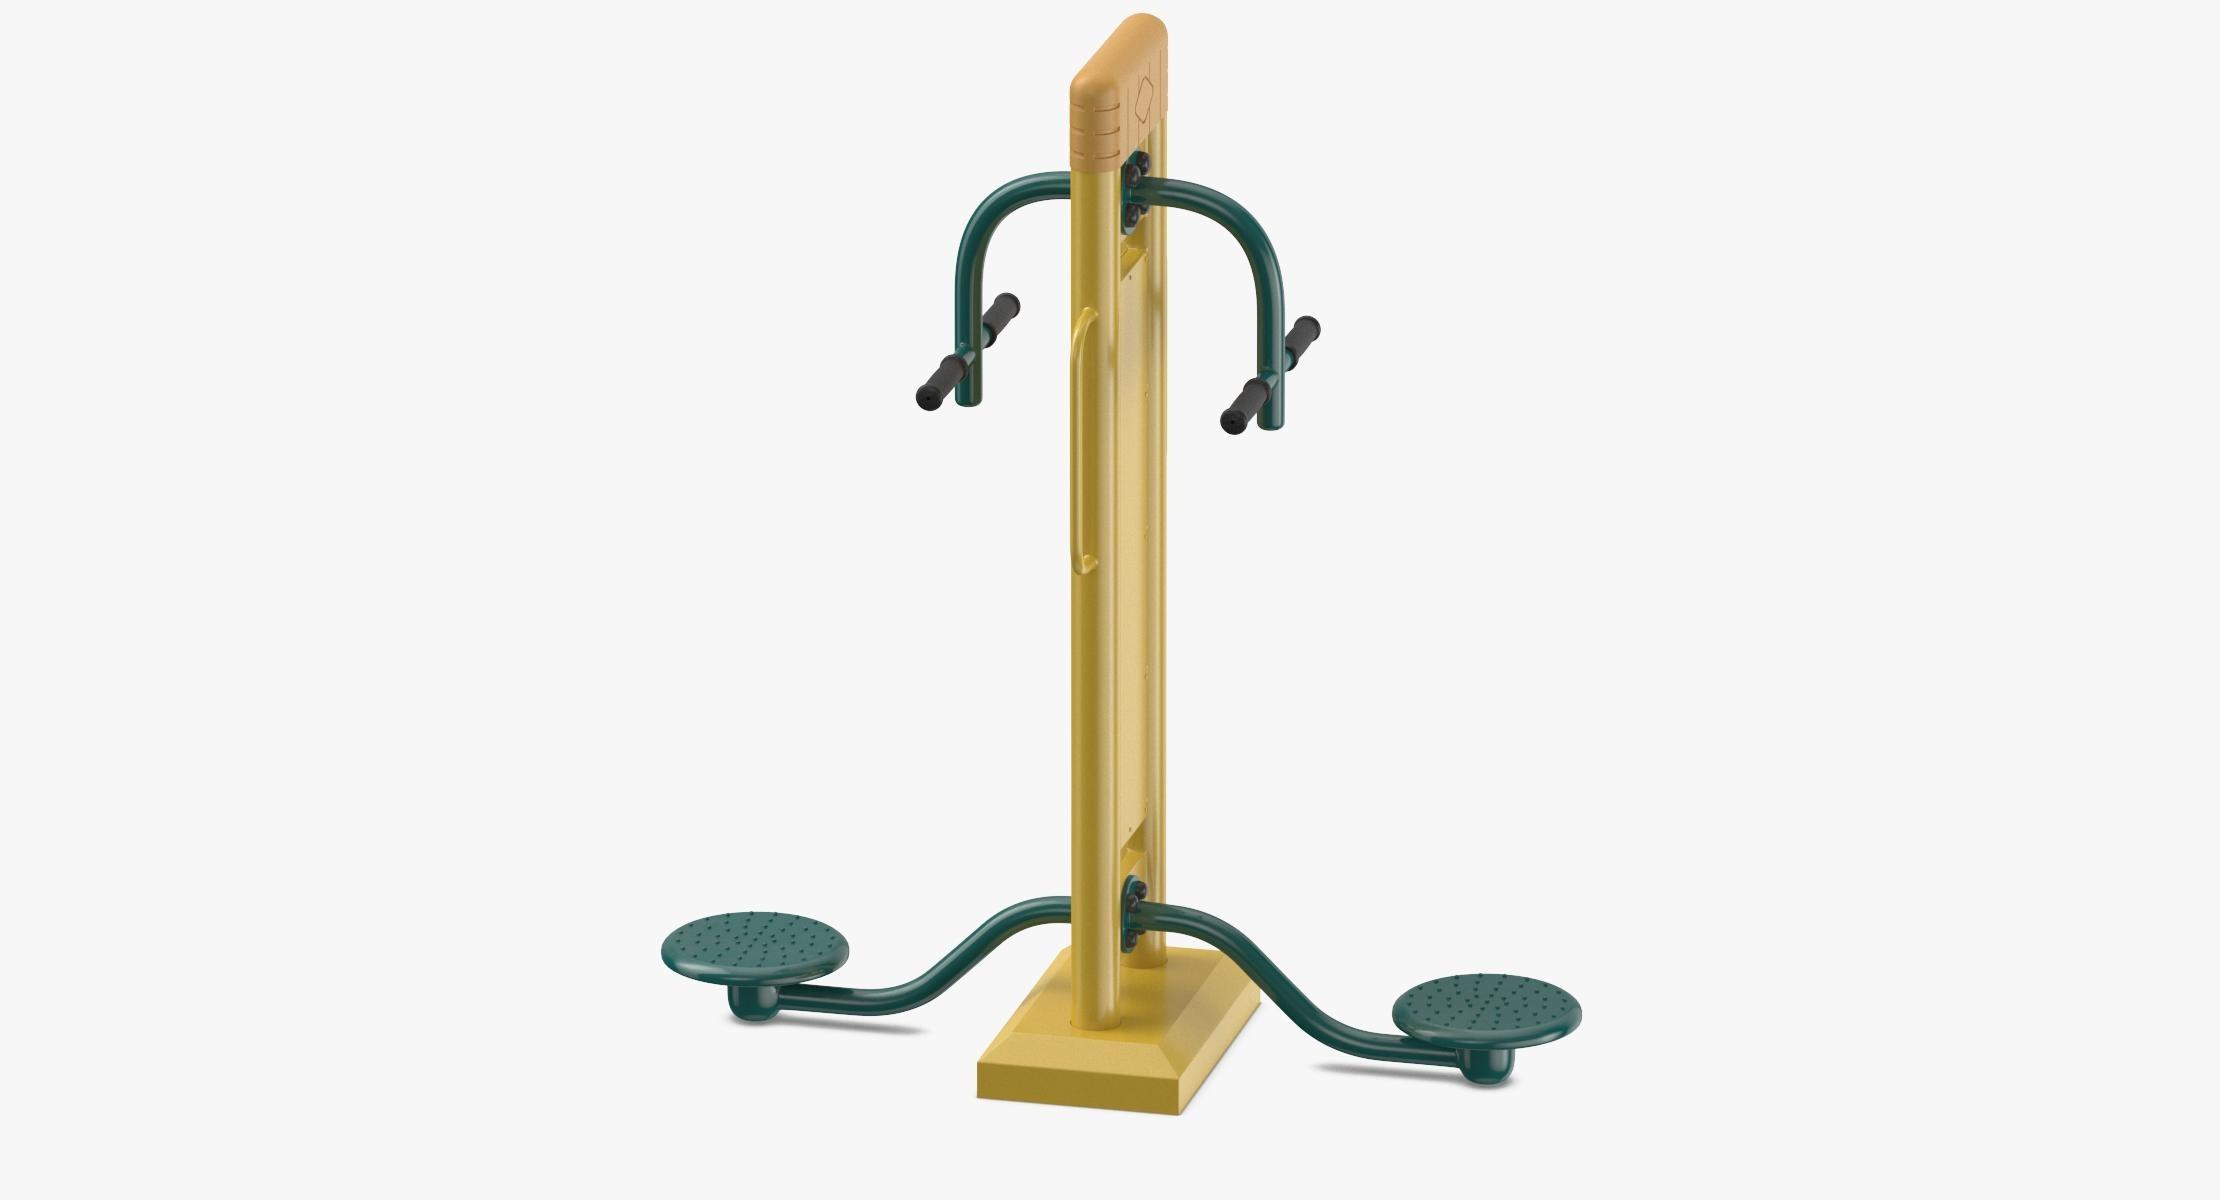 Street Fitness Equipment 01 02 - reel 1